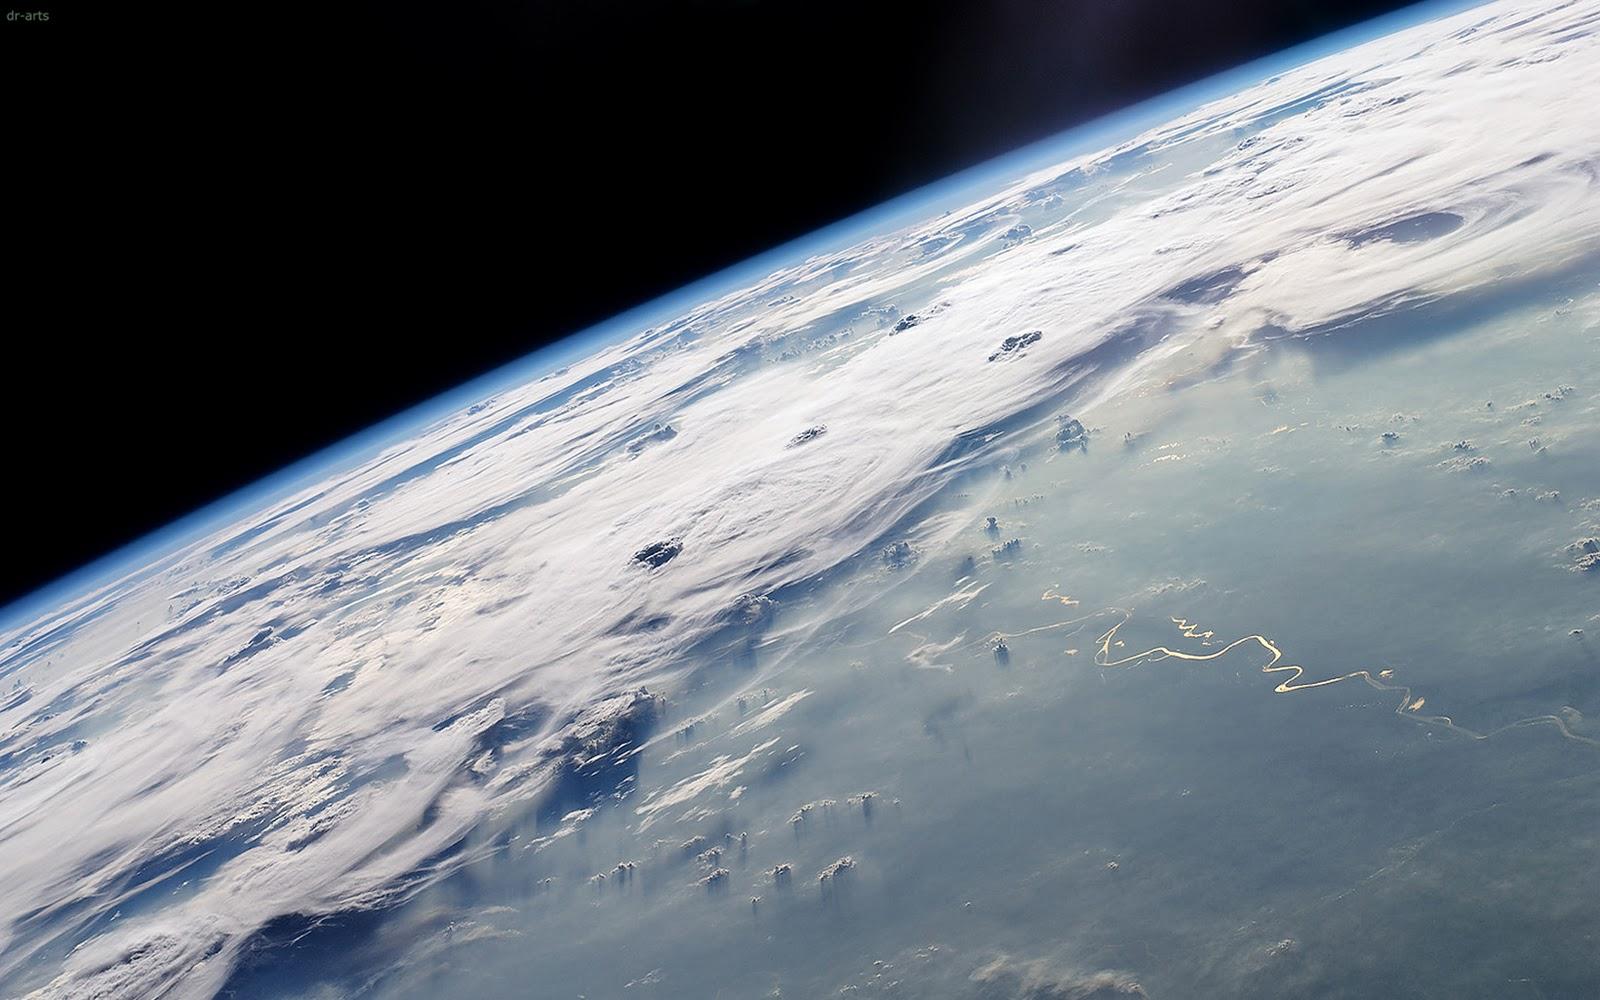 http://3.bp.blogspot.com/_-wodyymBlIY/TQ5HhirzTCI/AAAAAAAAIe4/qe8uxRzL8LM/s1600/Planeta_Terra_HD+%252810%2529.jpg